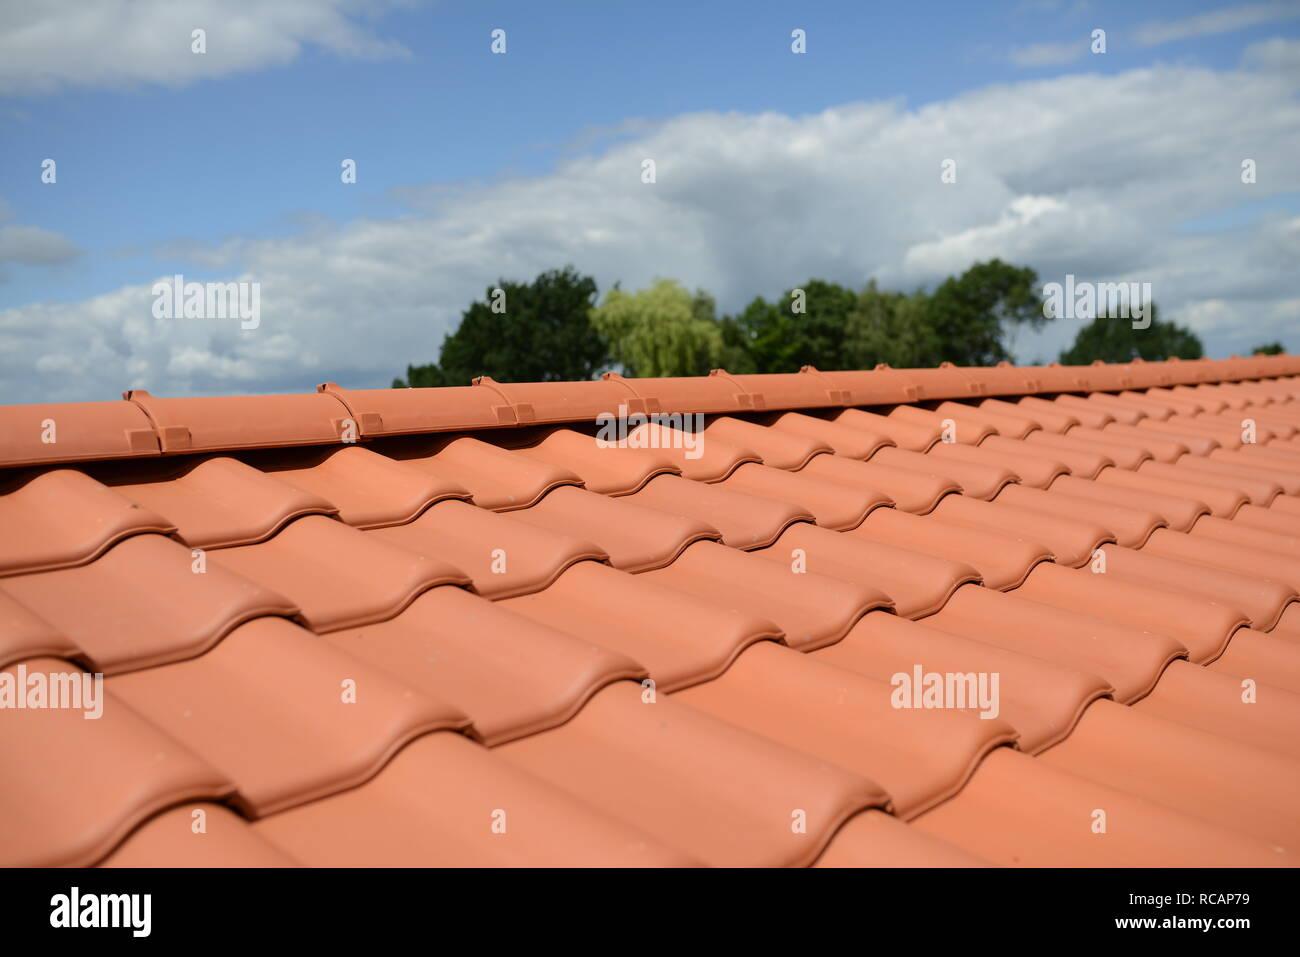 Relativ Dach Dachdeckung Stockfotos & Dach Dachdeckung Bilder - Alamy CD99